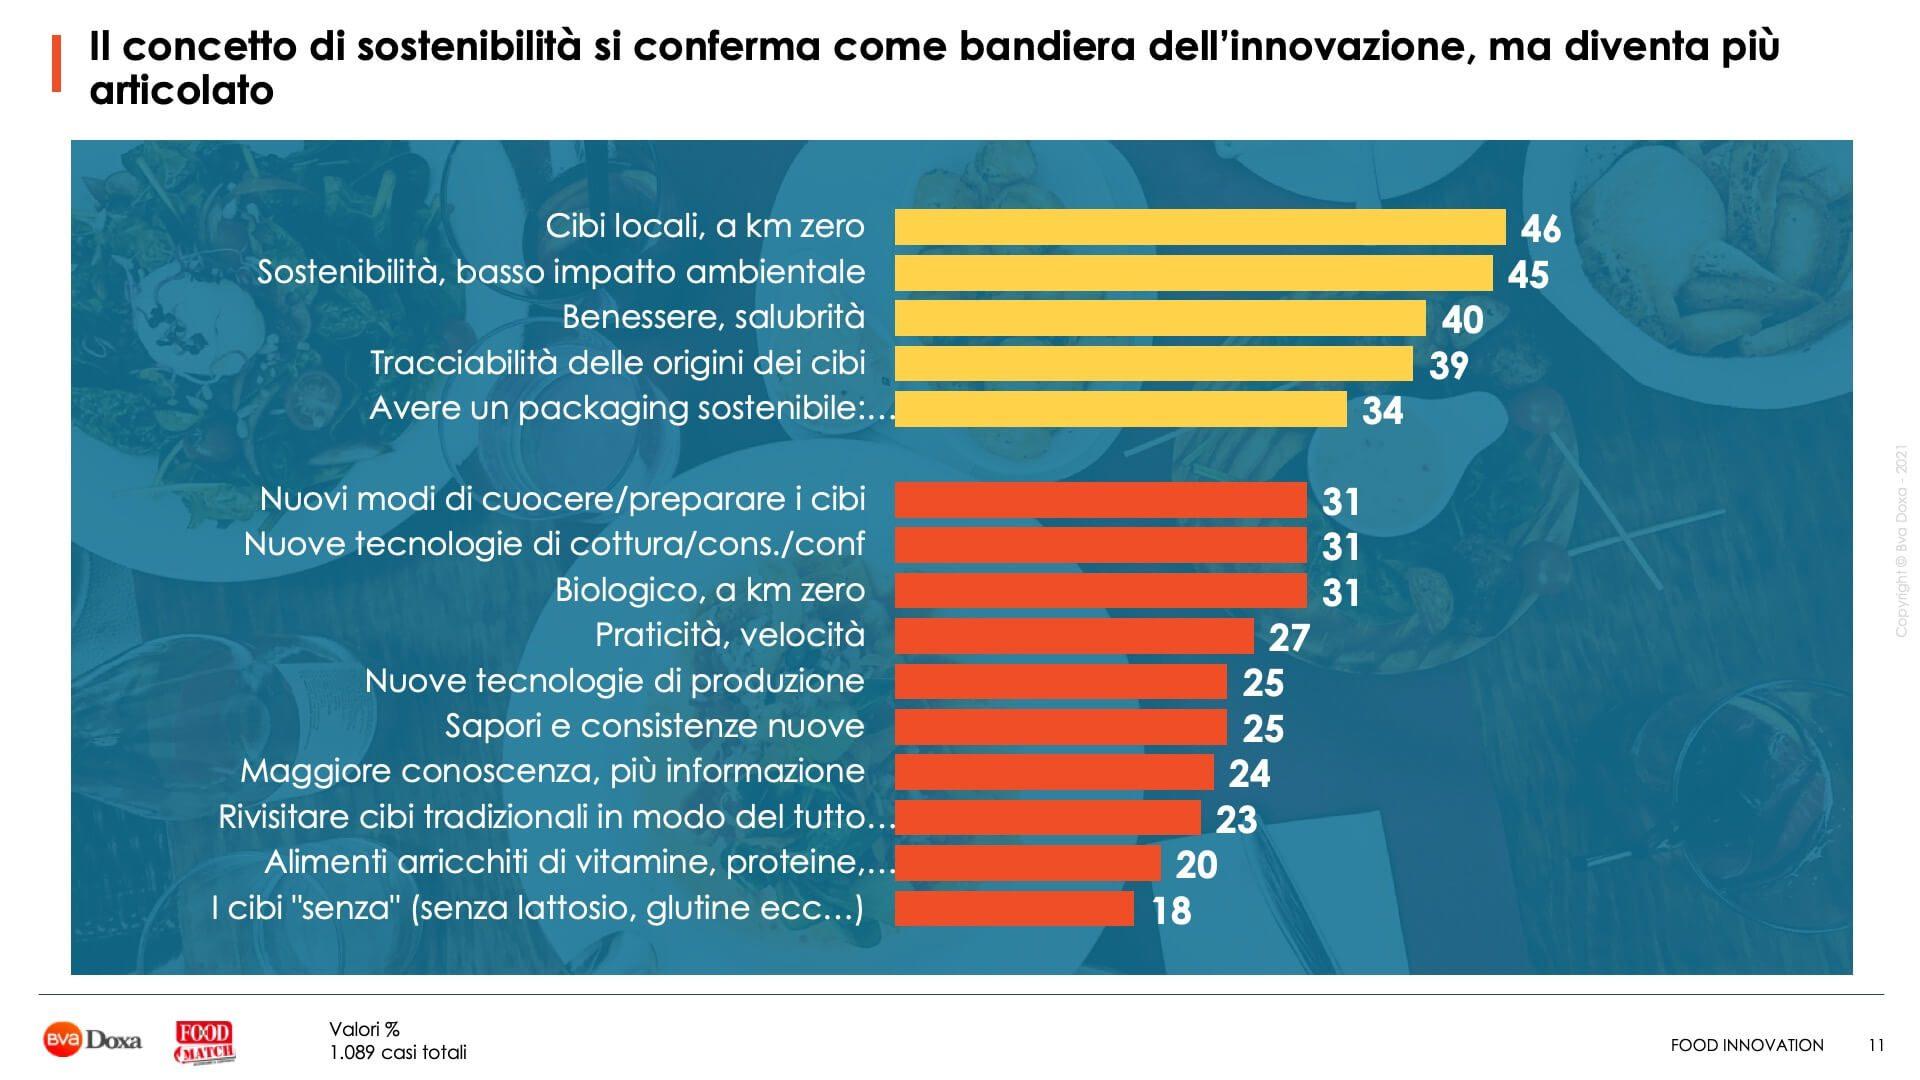 Food Innovation Conti Doxa Bva 10